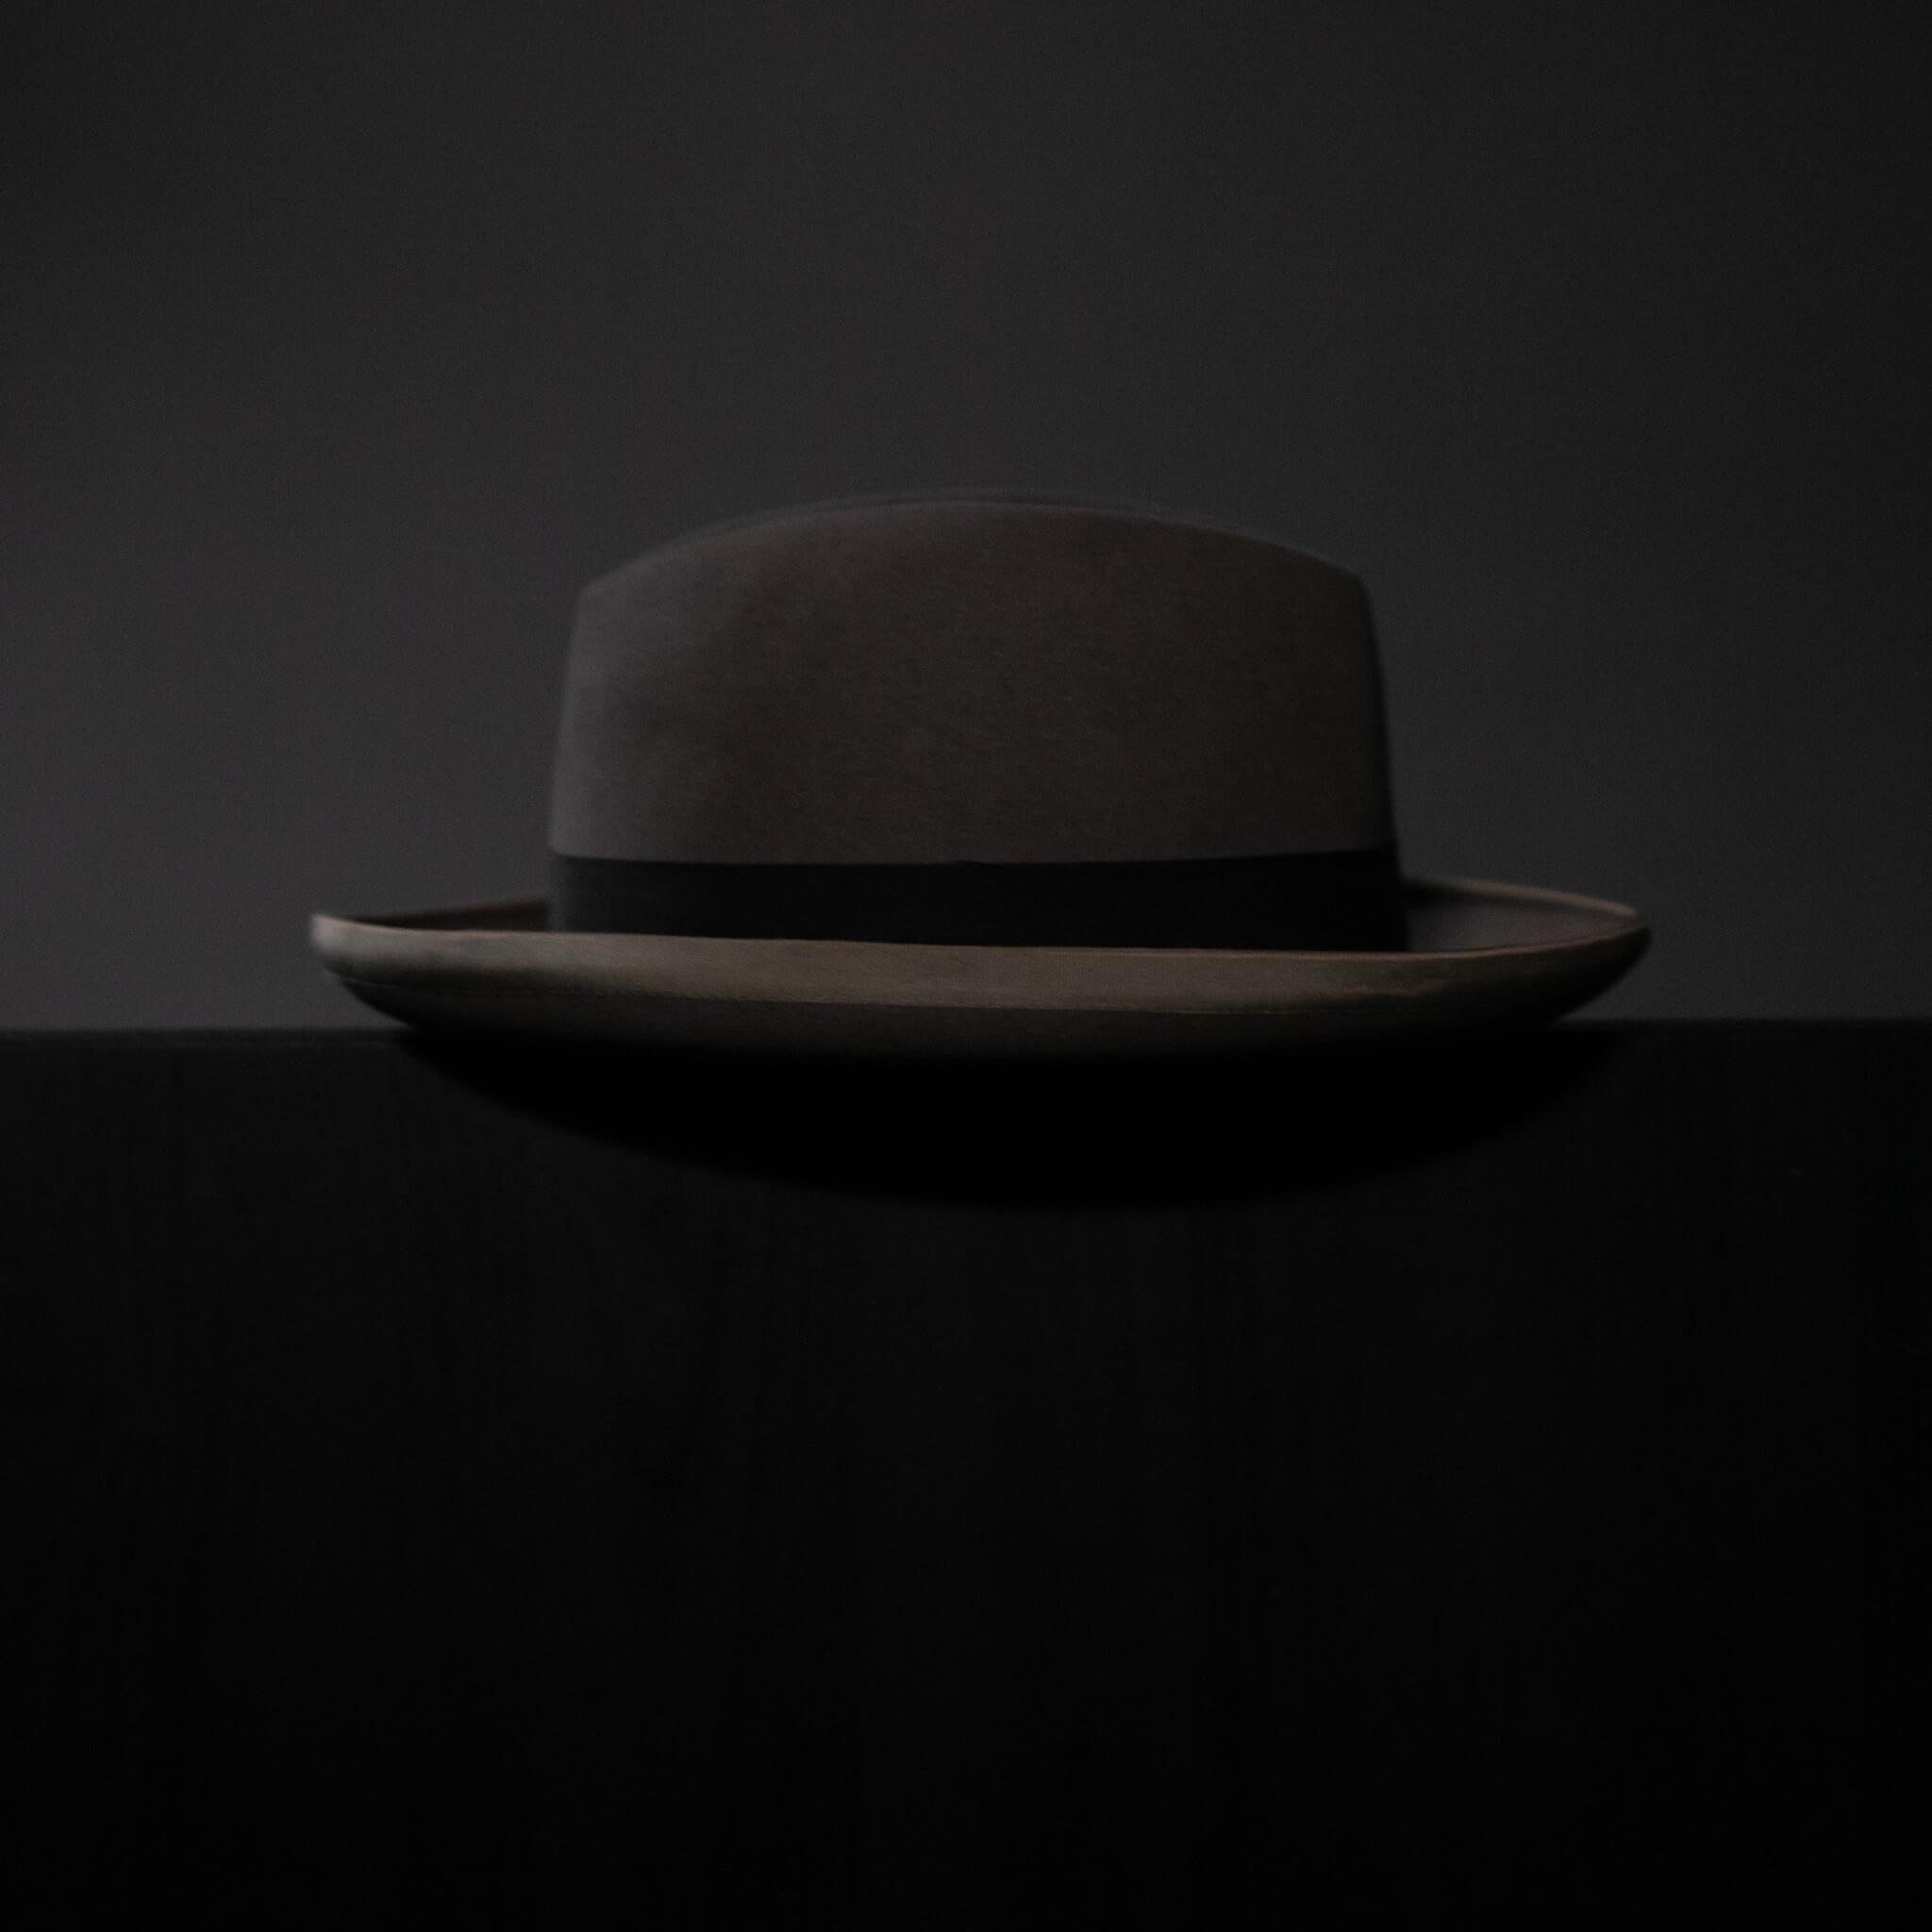 C8692D91 7E2F 4EEB A5E0 5DF8099CABC1 - That Hat!